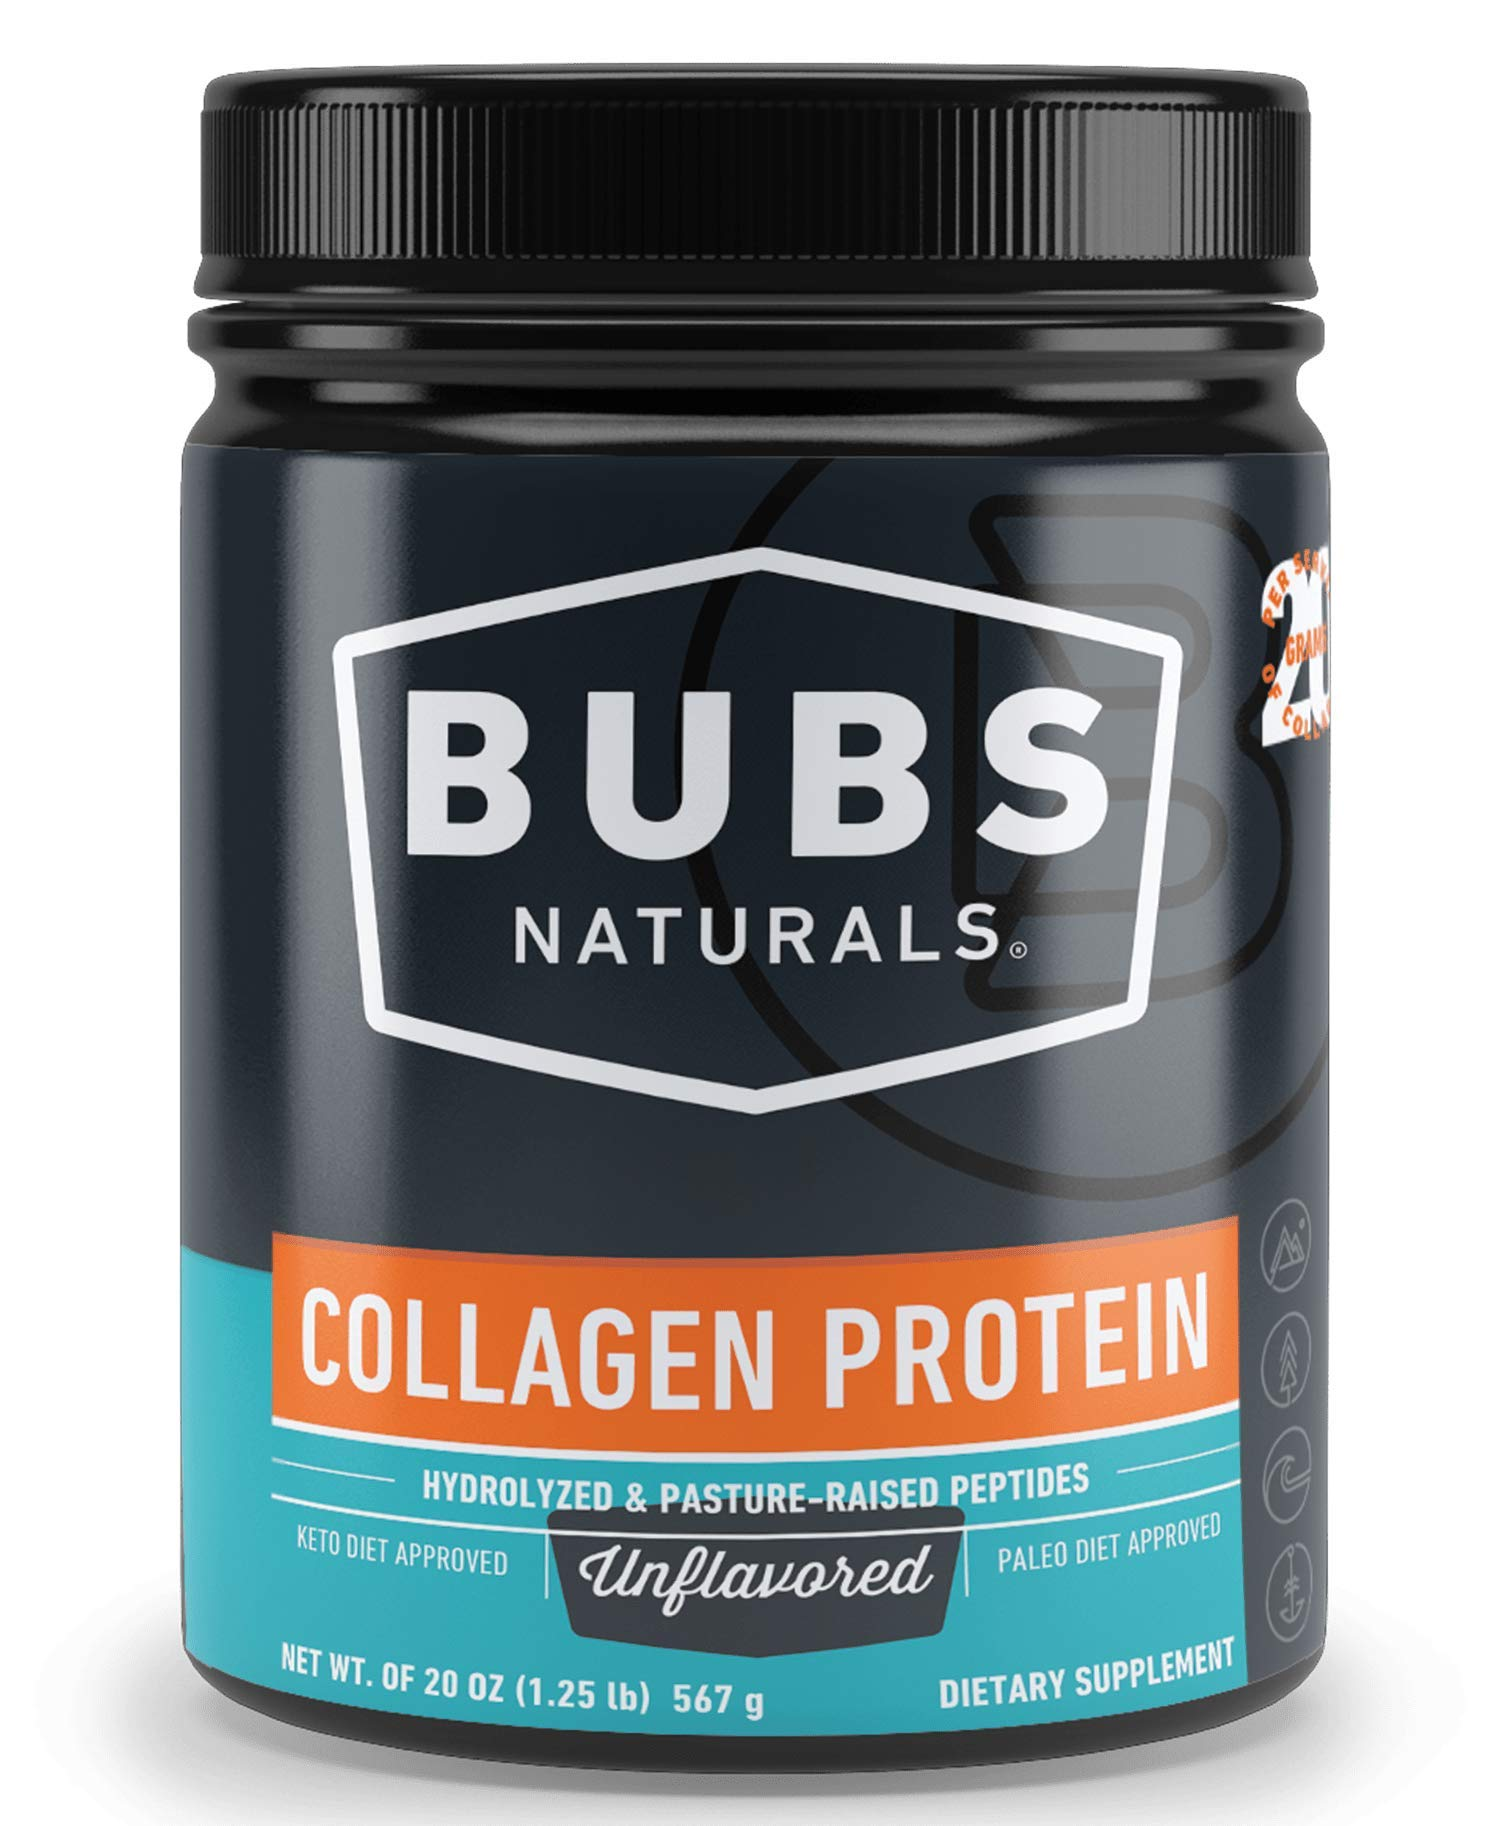 BUBS Naturals Pasture Raised Grass-Fed Collagen Peptides | Paleo & Keto Diet Friendly | Non - GMO | Dairy-Free Gluten-Free | Mixes Easy | Unflavored Collagen Powder | by BUBS Naturals